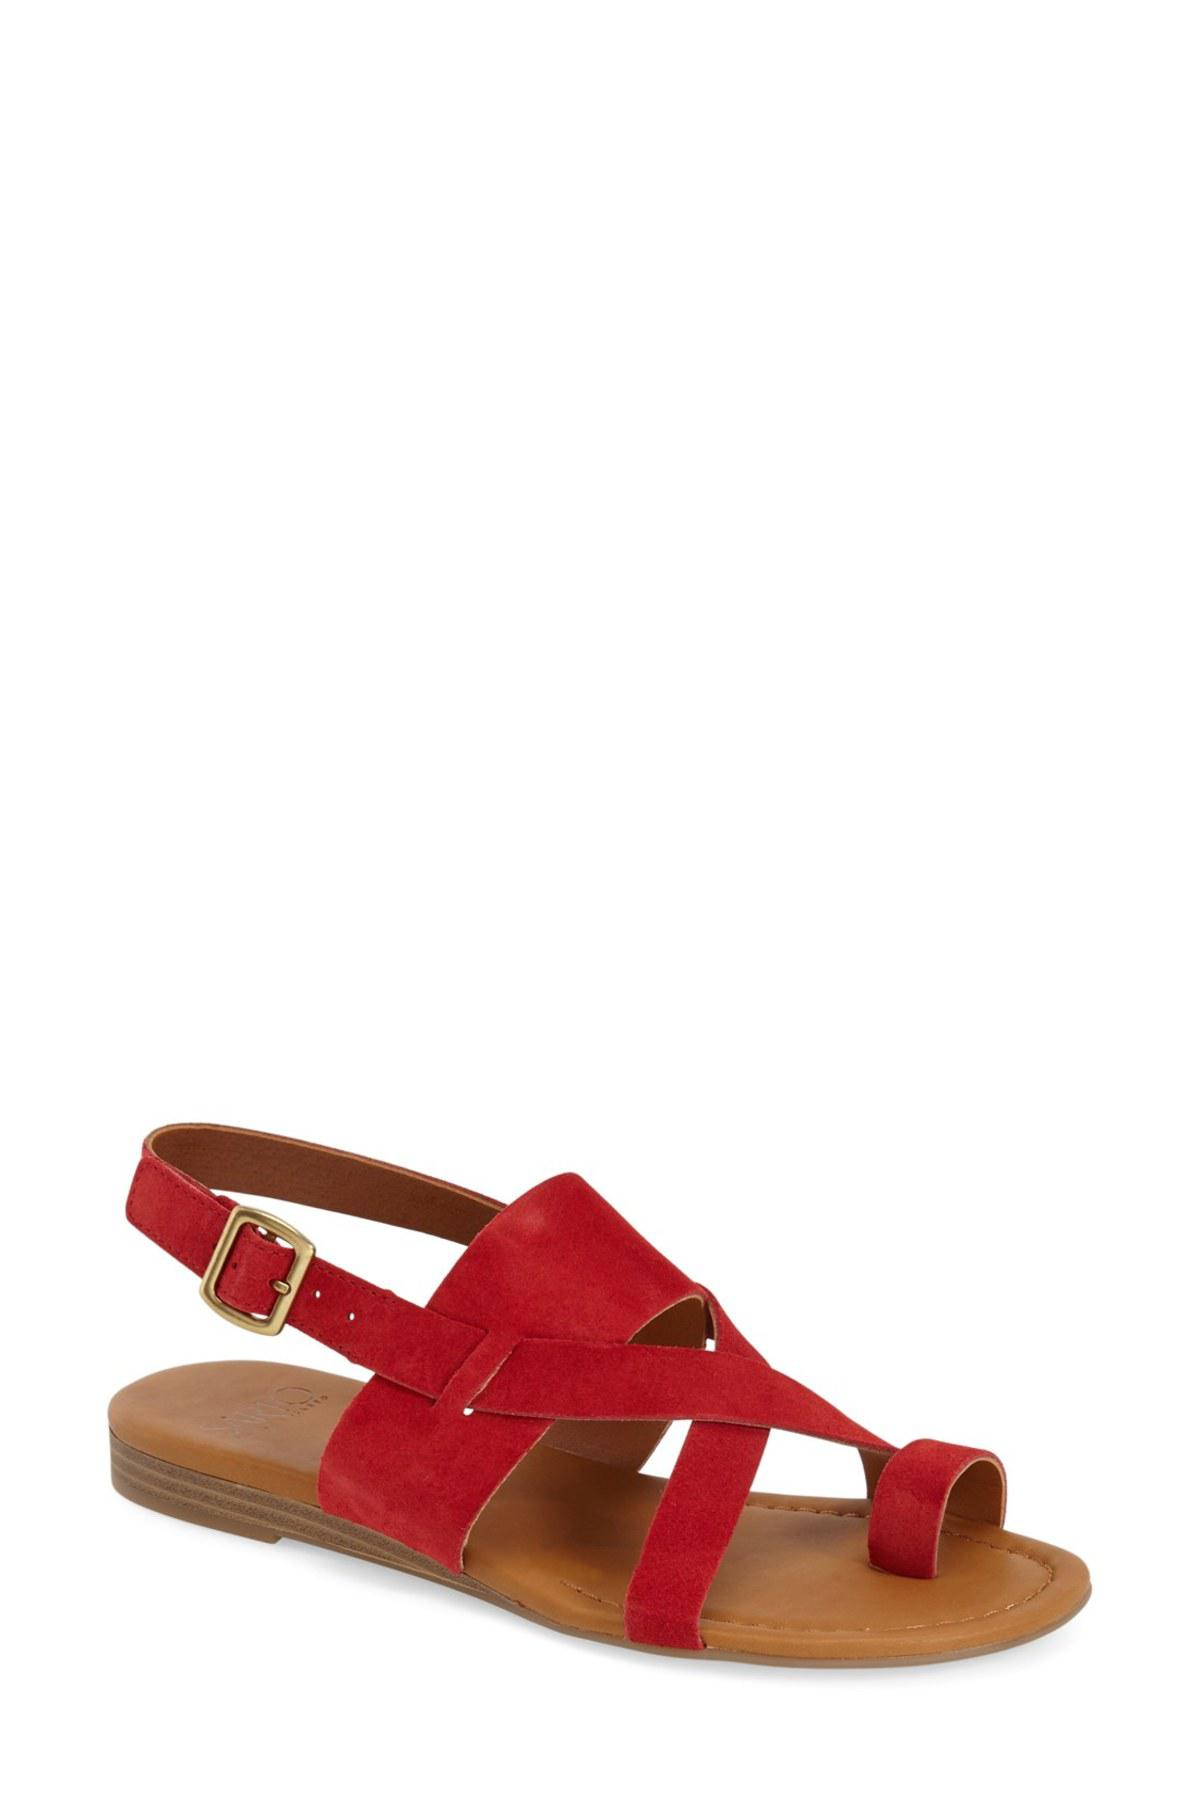 Lyst Franco Sarto Gia Sandal Women In Red